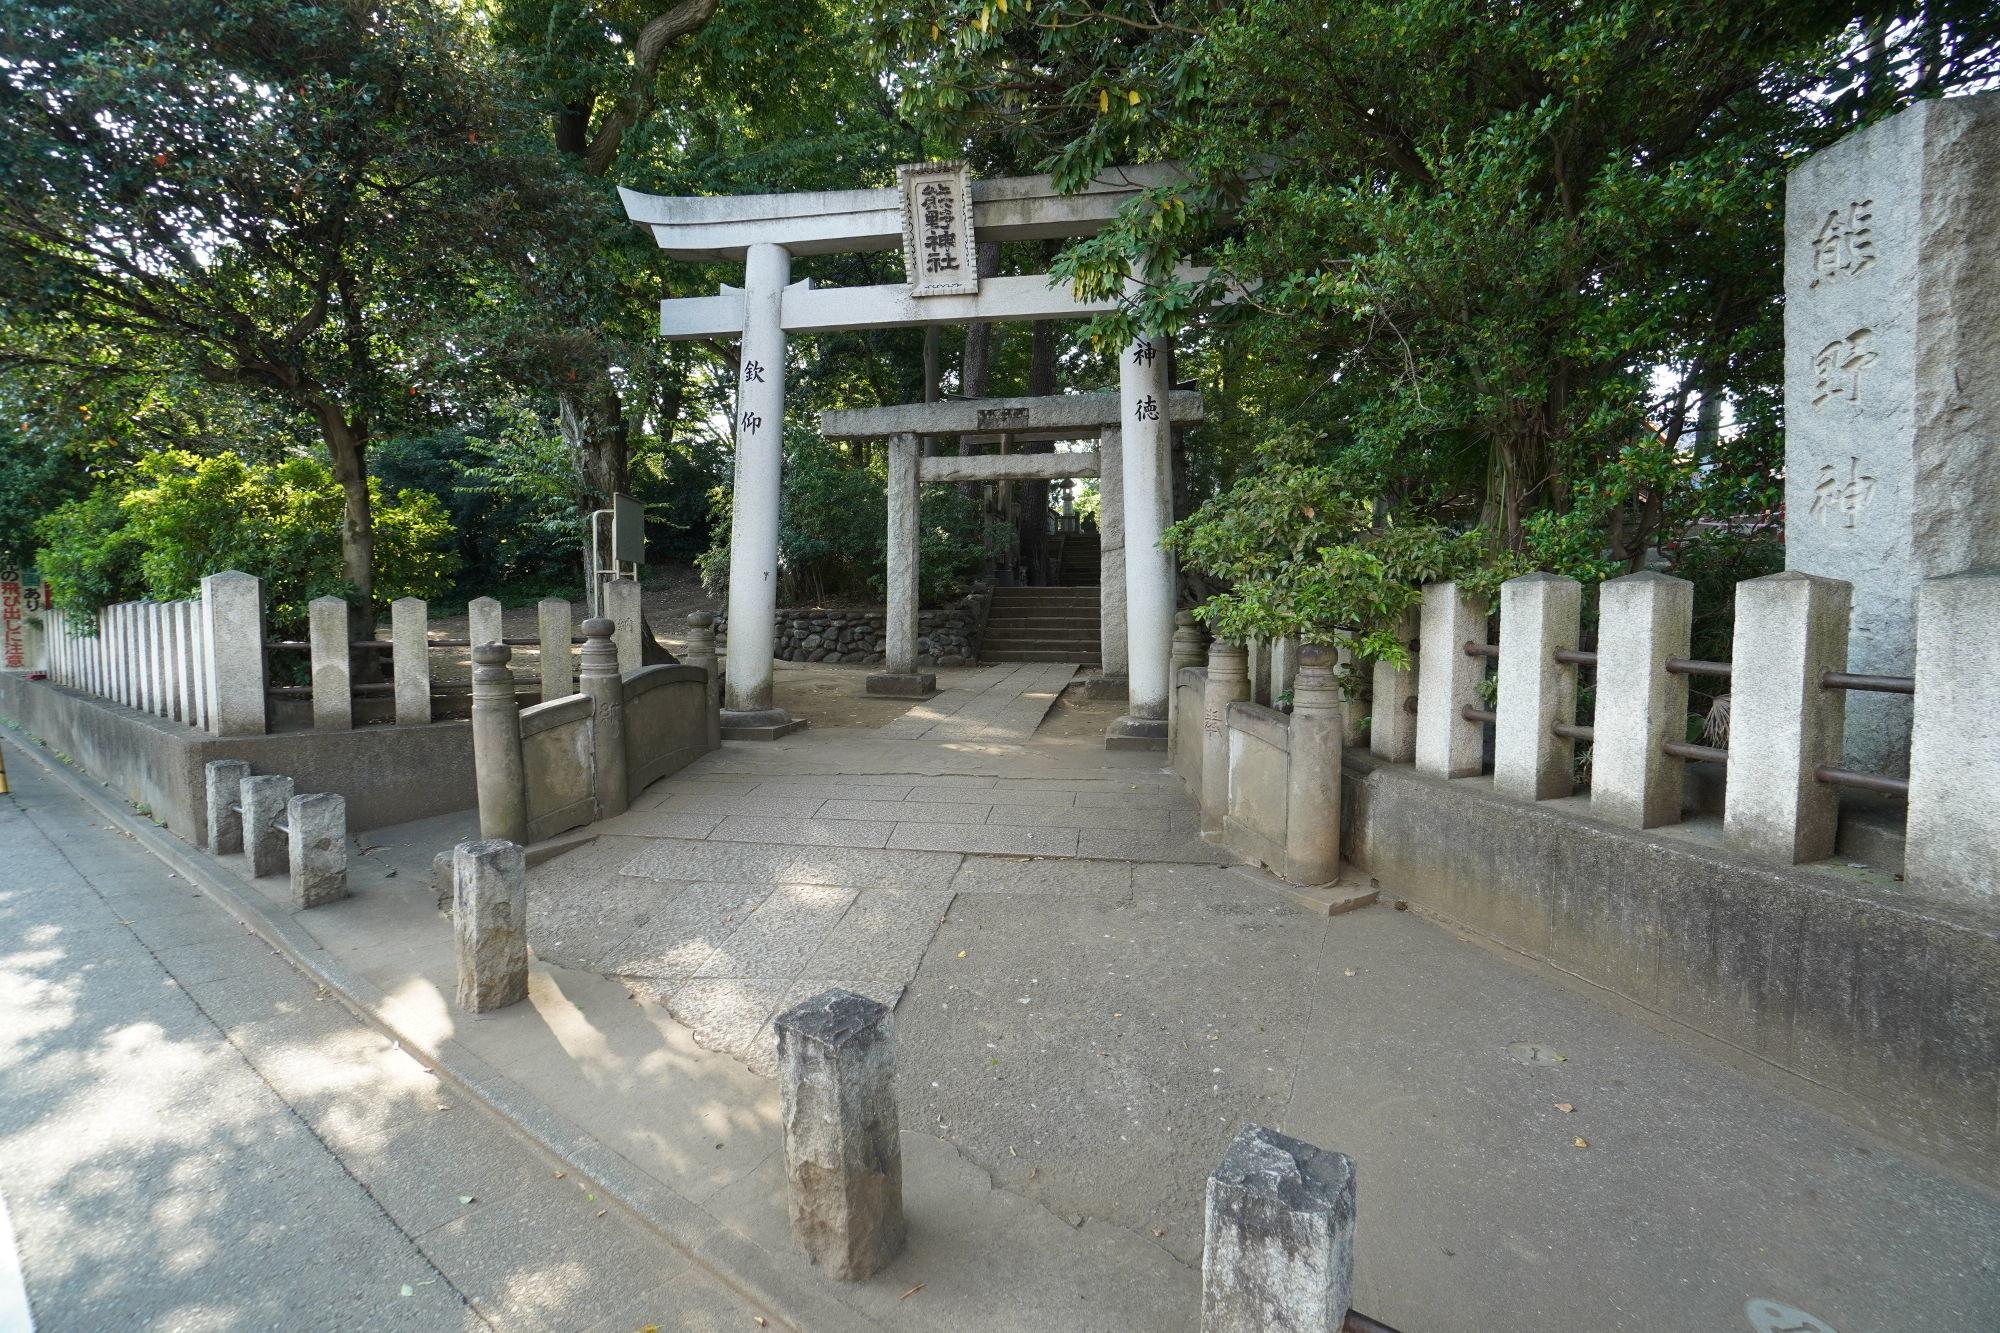 和泉熊野神社の鳥居